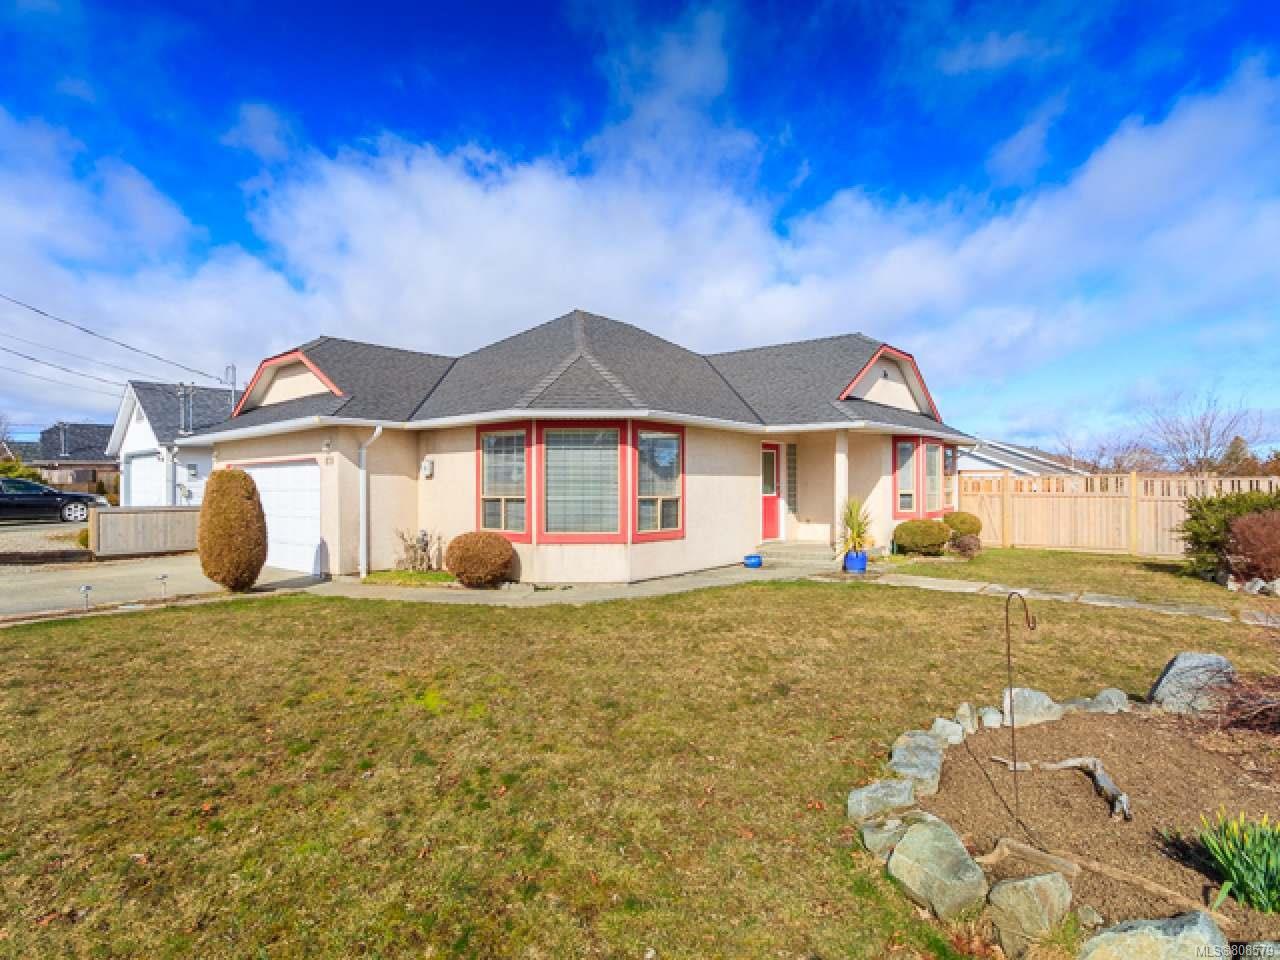 Main Photo: 878 Temple St in PARKSVILLE: PQ Parksville House for sale (Parksville/Qualicum)  : MLS®# 808579